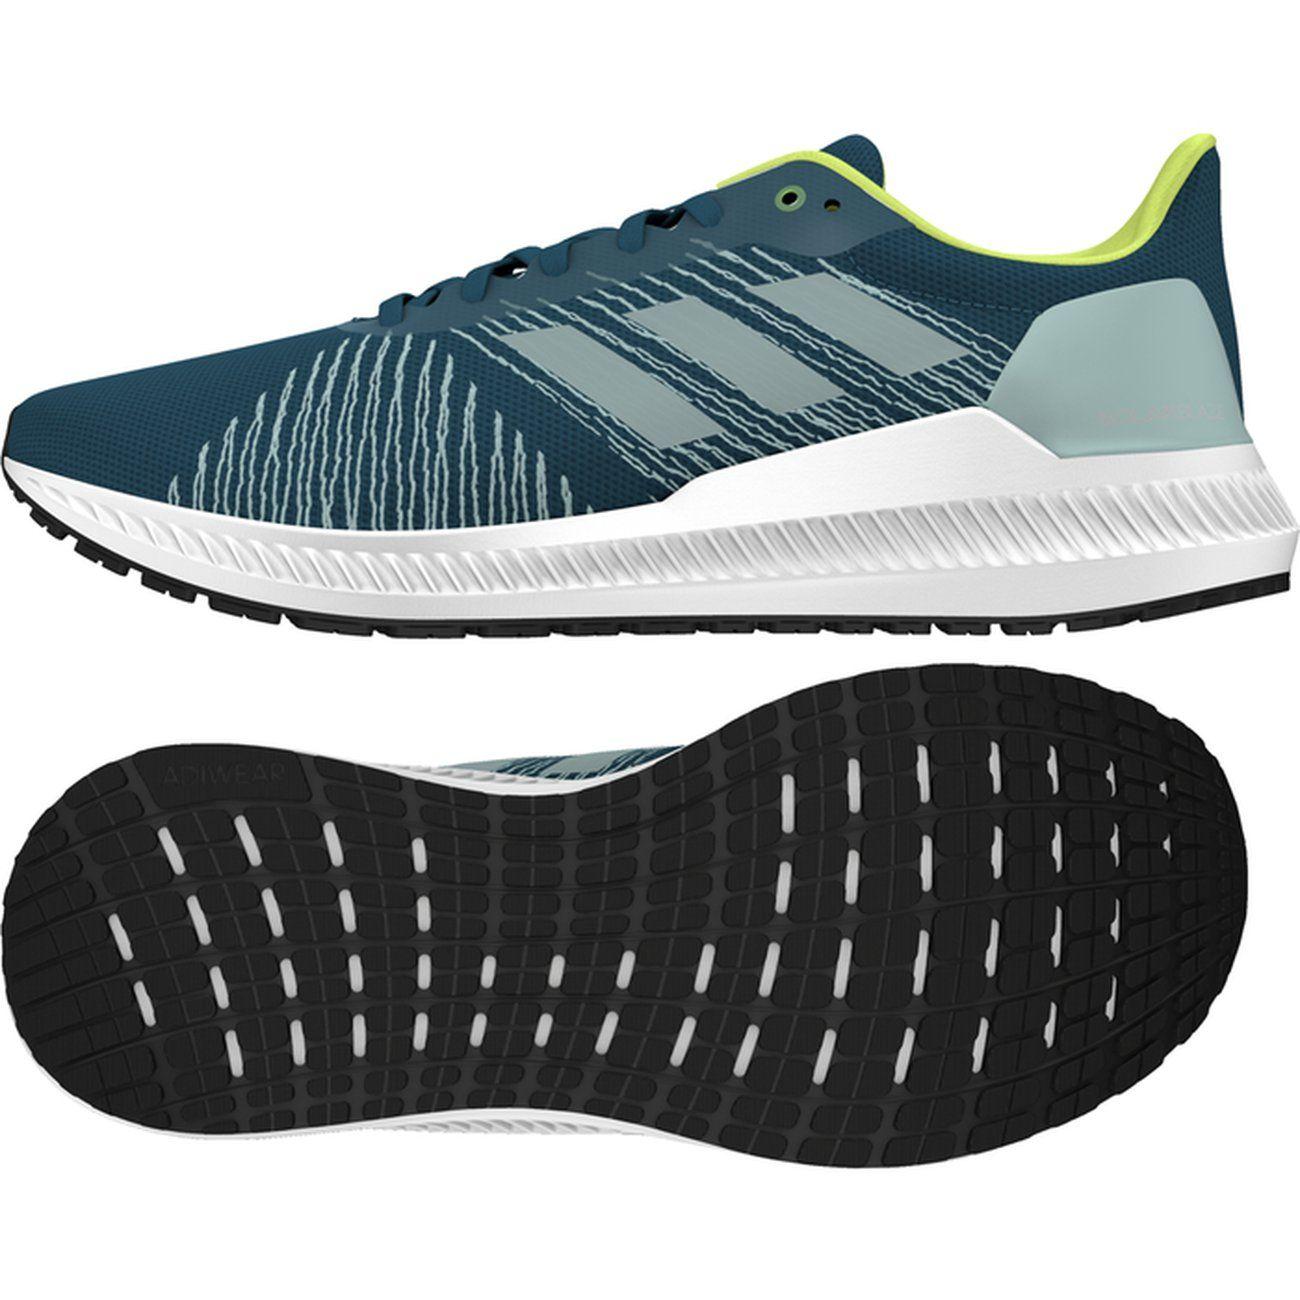 Adidas Homme Basses Solar Chaussures Blaze Running YvI7ybgf6